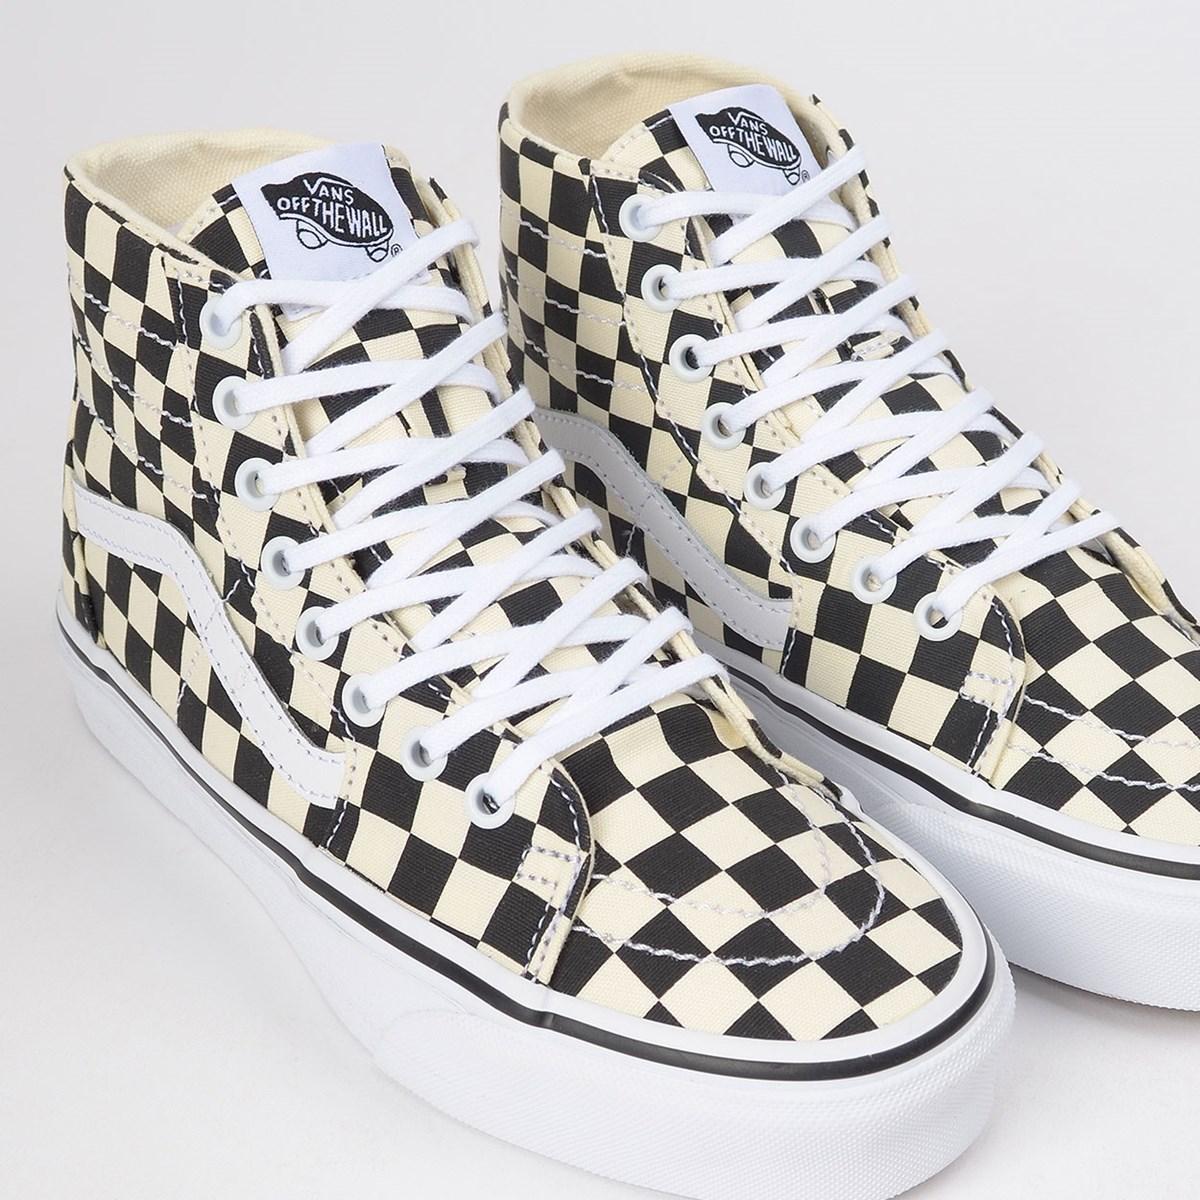 Tênis Vans Sk8 Hi Tapered Checkerboard Black True White VN0A4U165GU